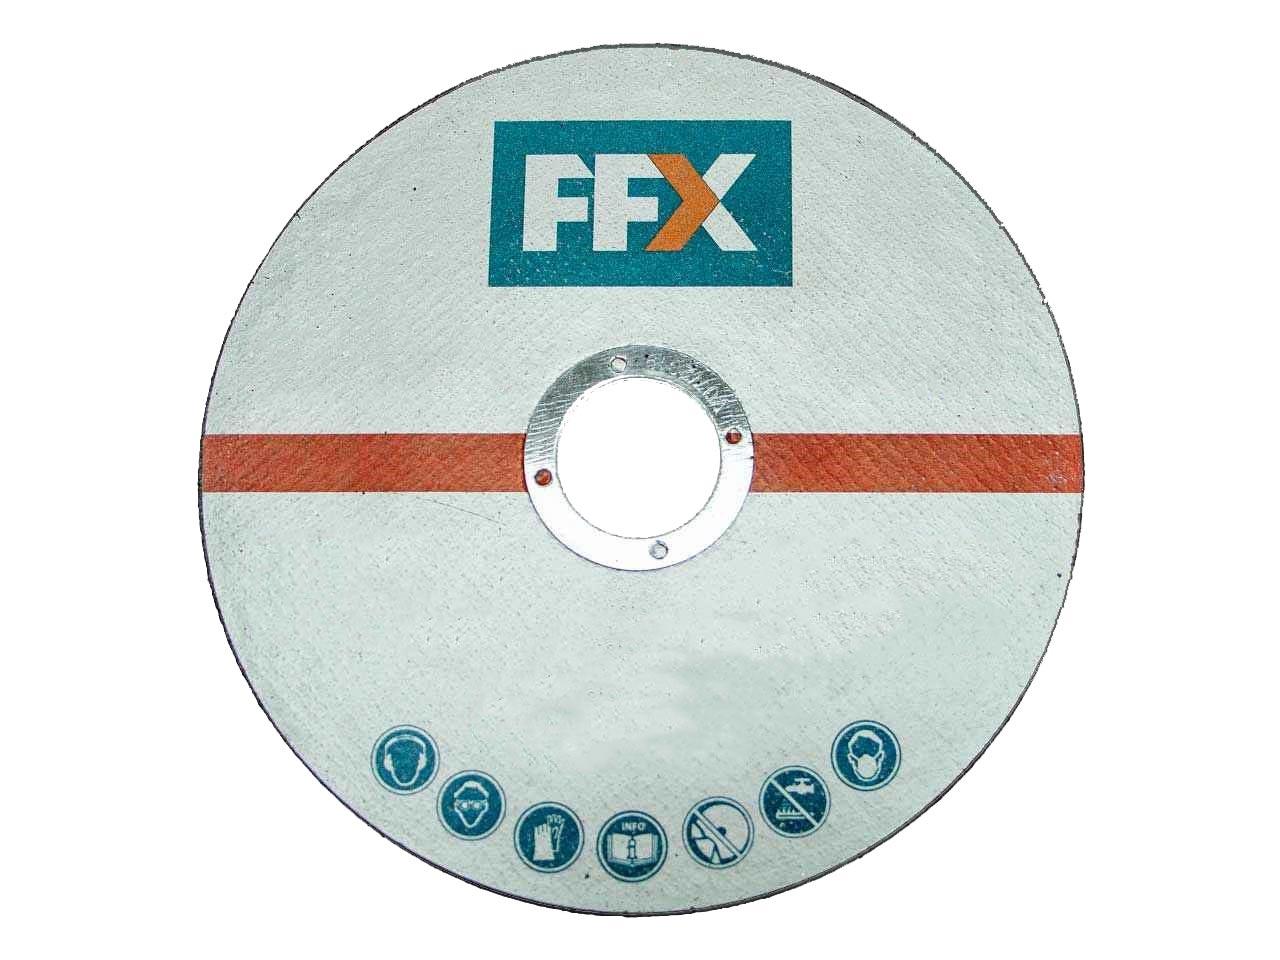 FFX_DiscGeneric.jpg